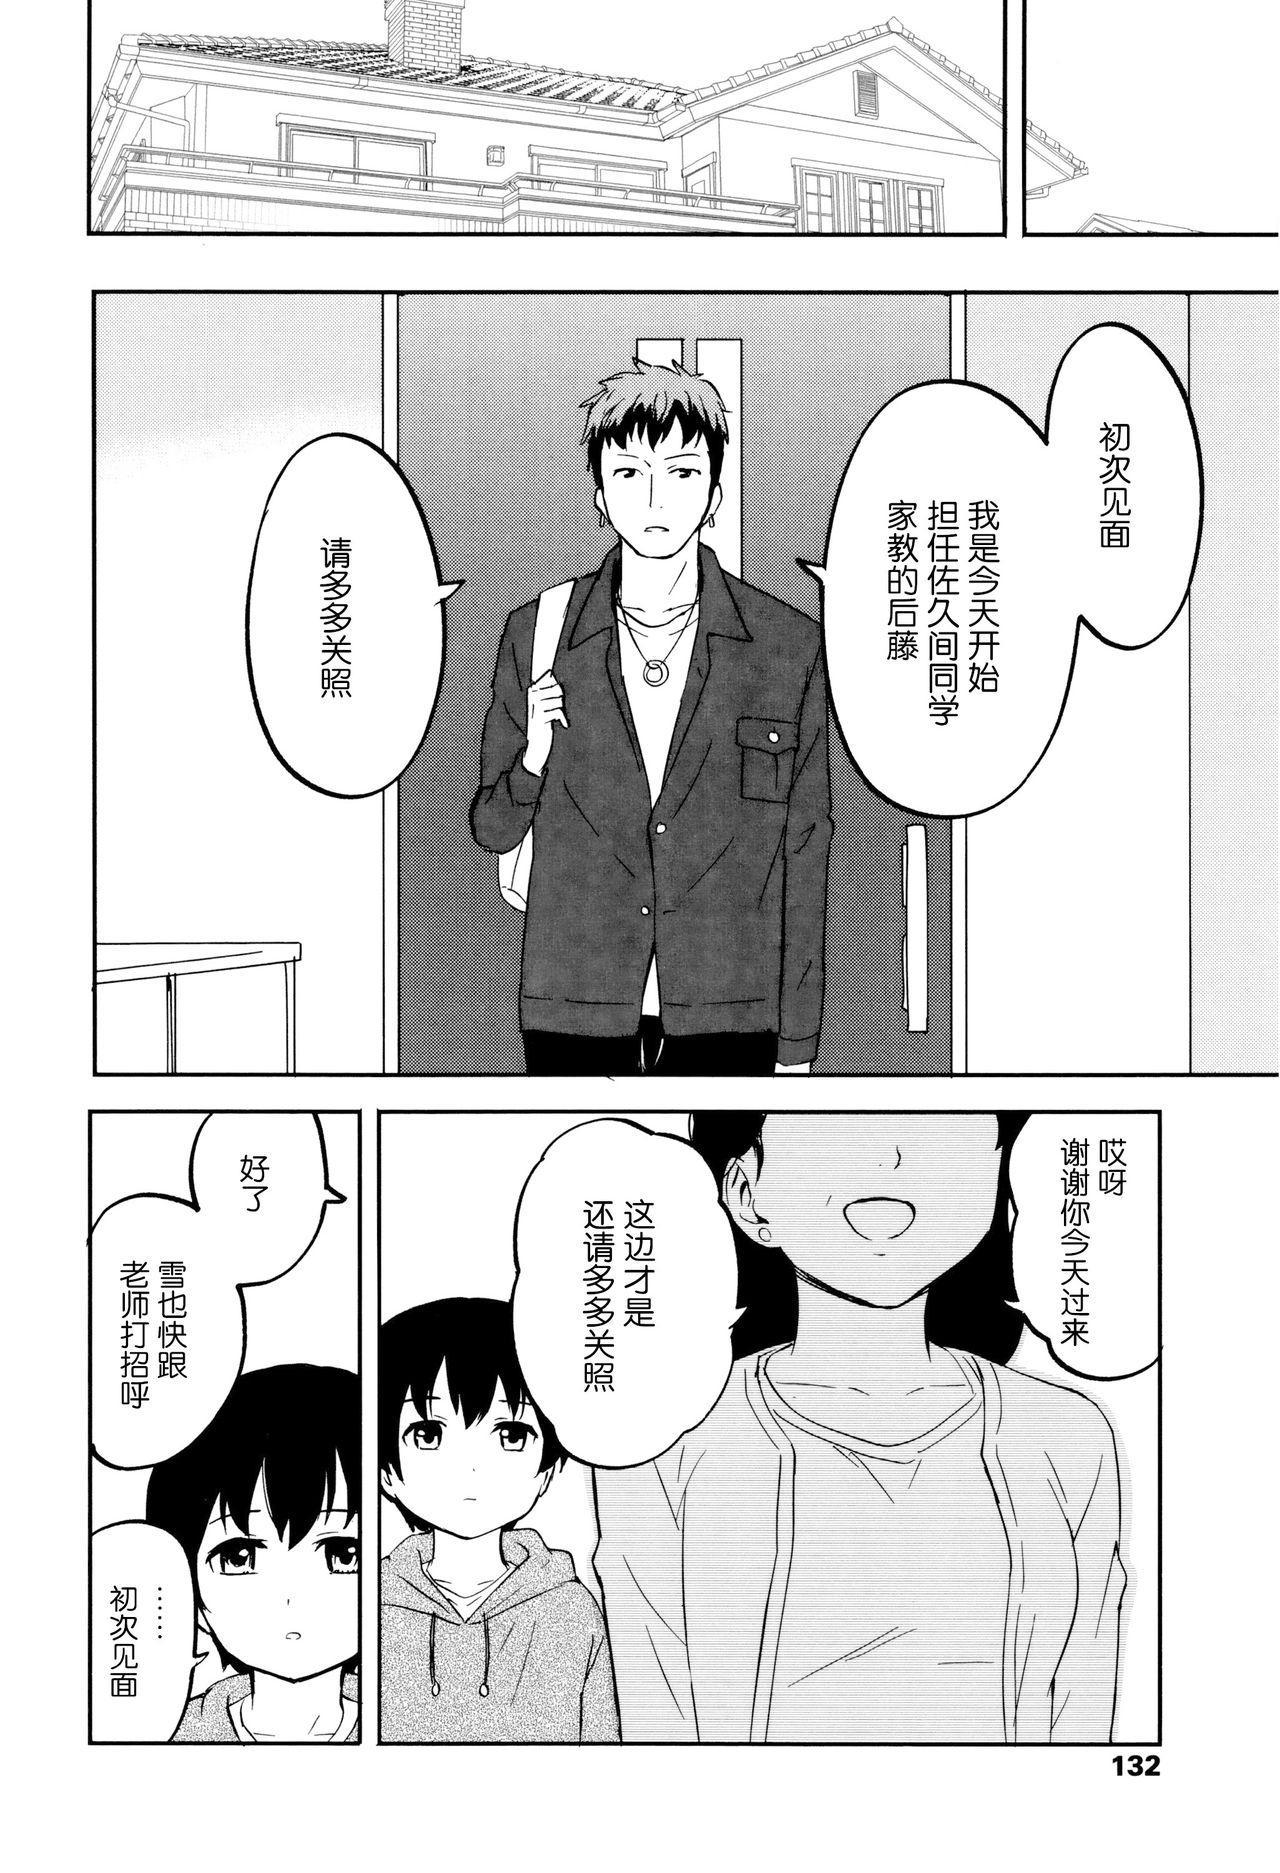 Tokubetsu na Mainichi - Special daily 134